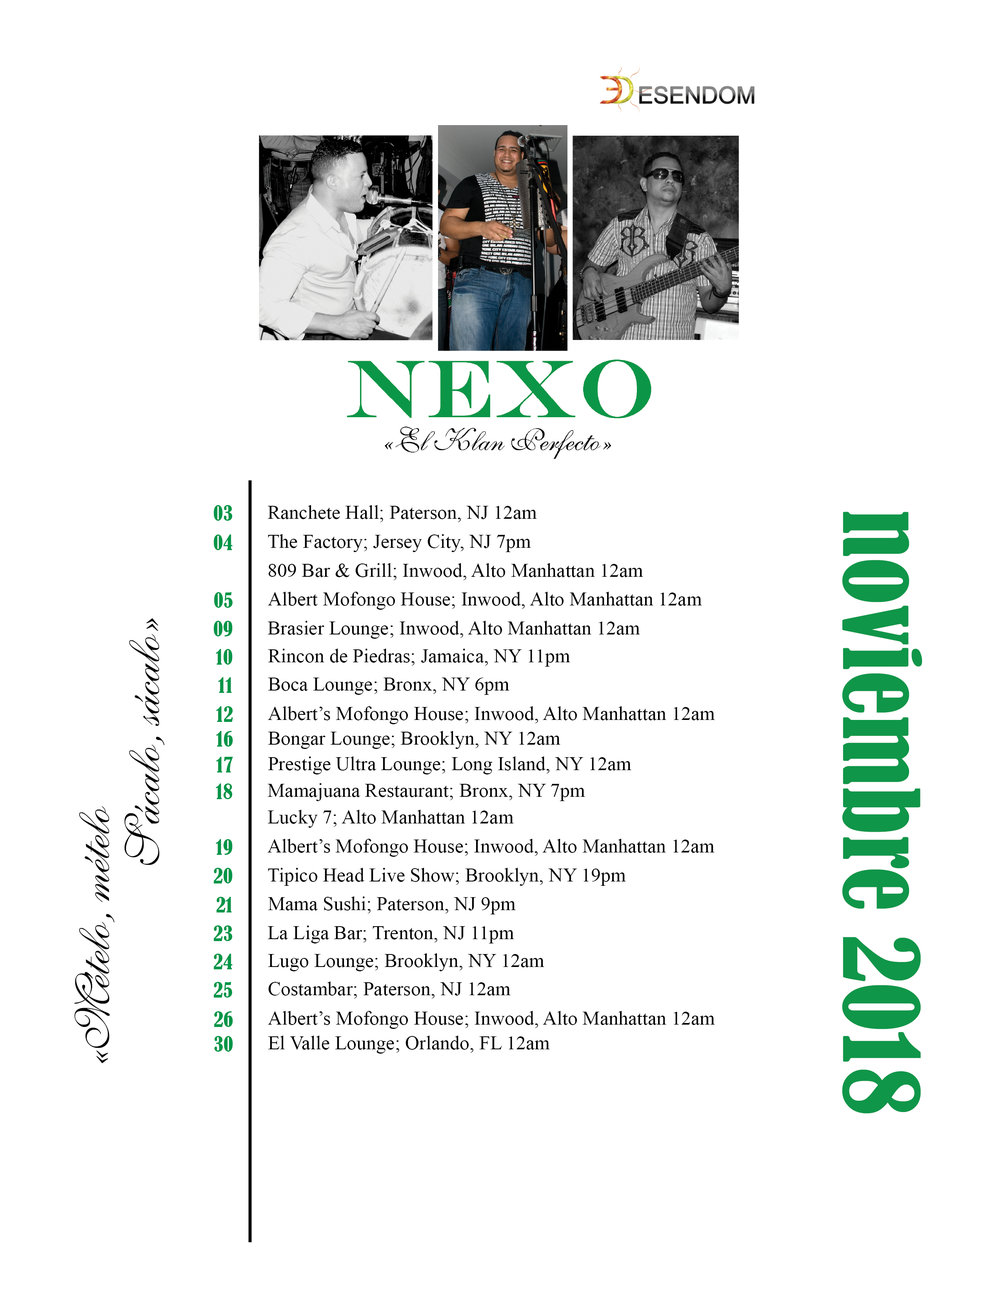 Itinerario nov 2018 Nexo.jpg